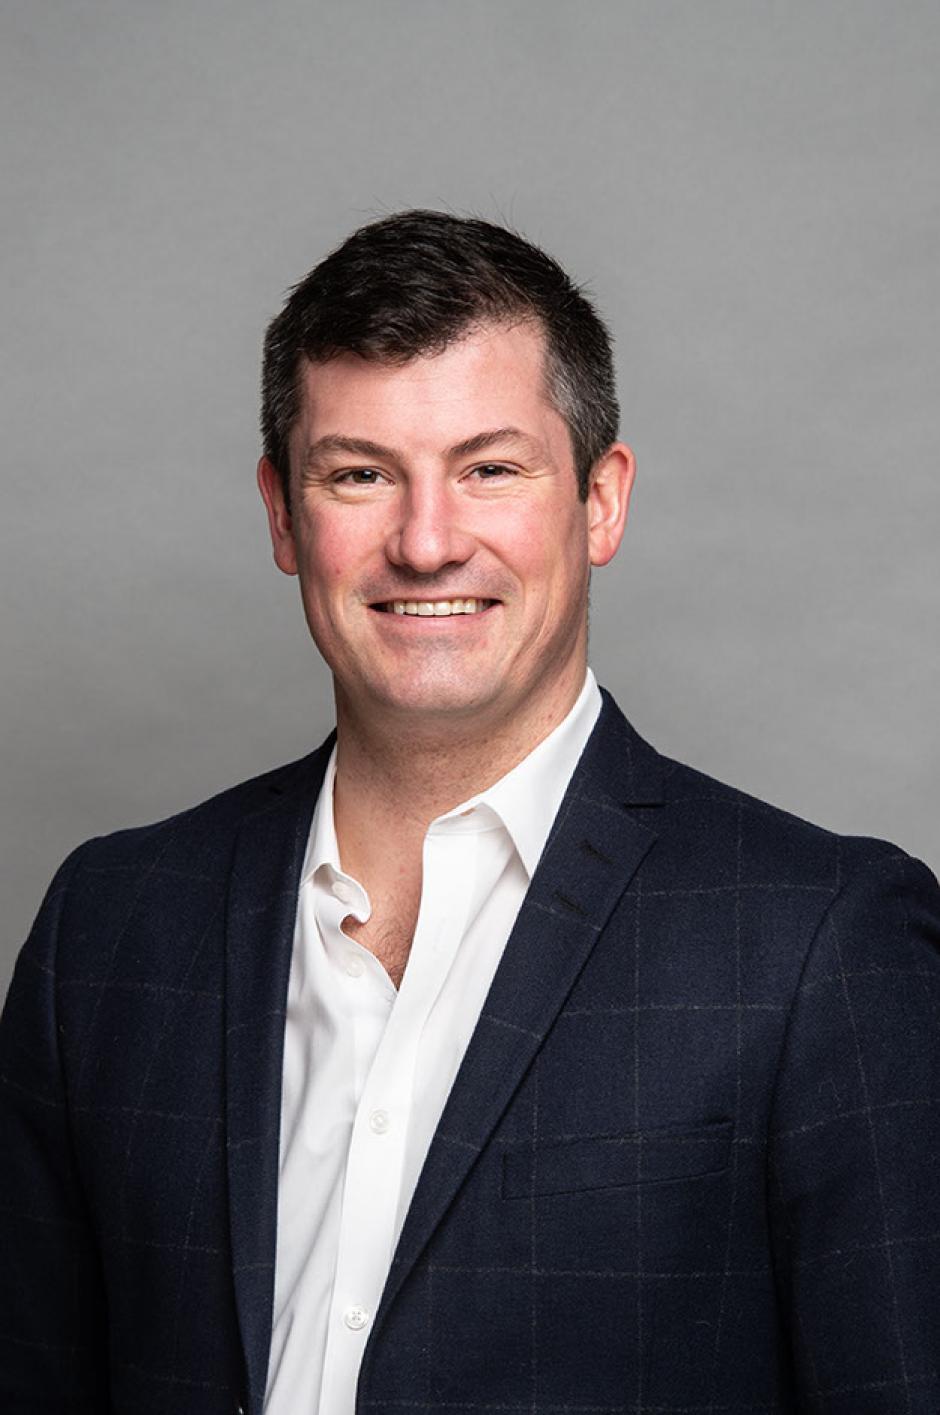 Headshot of Banff Centre Governor, Rafi Richardson.